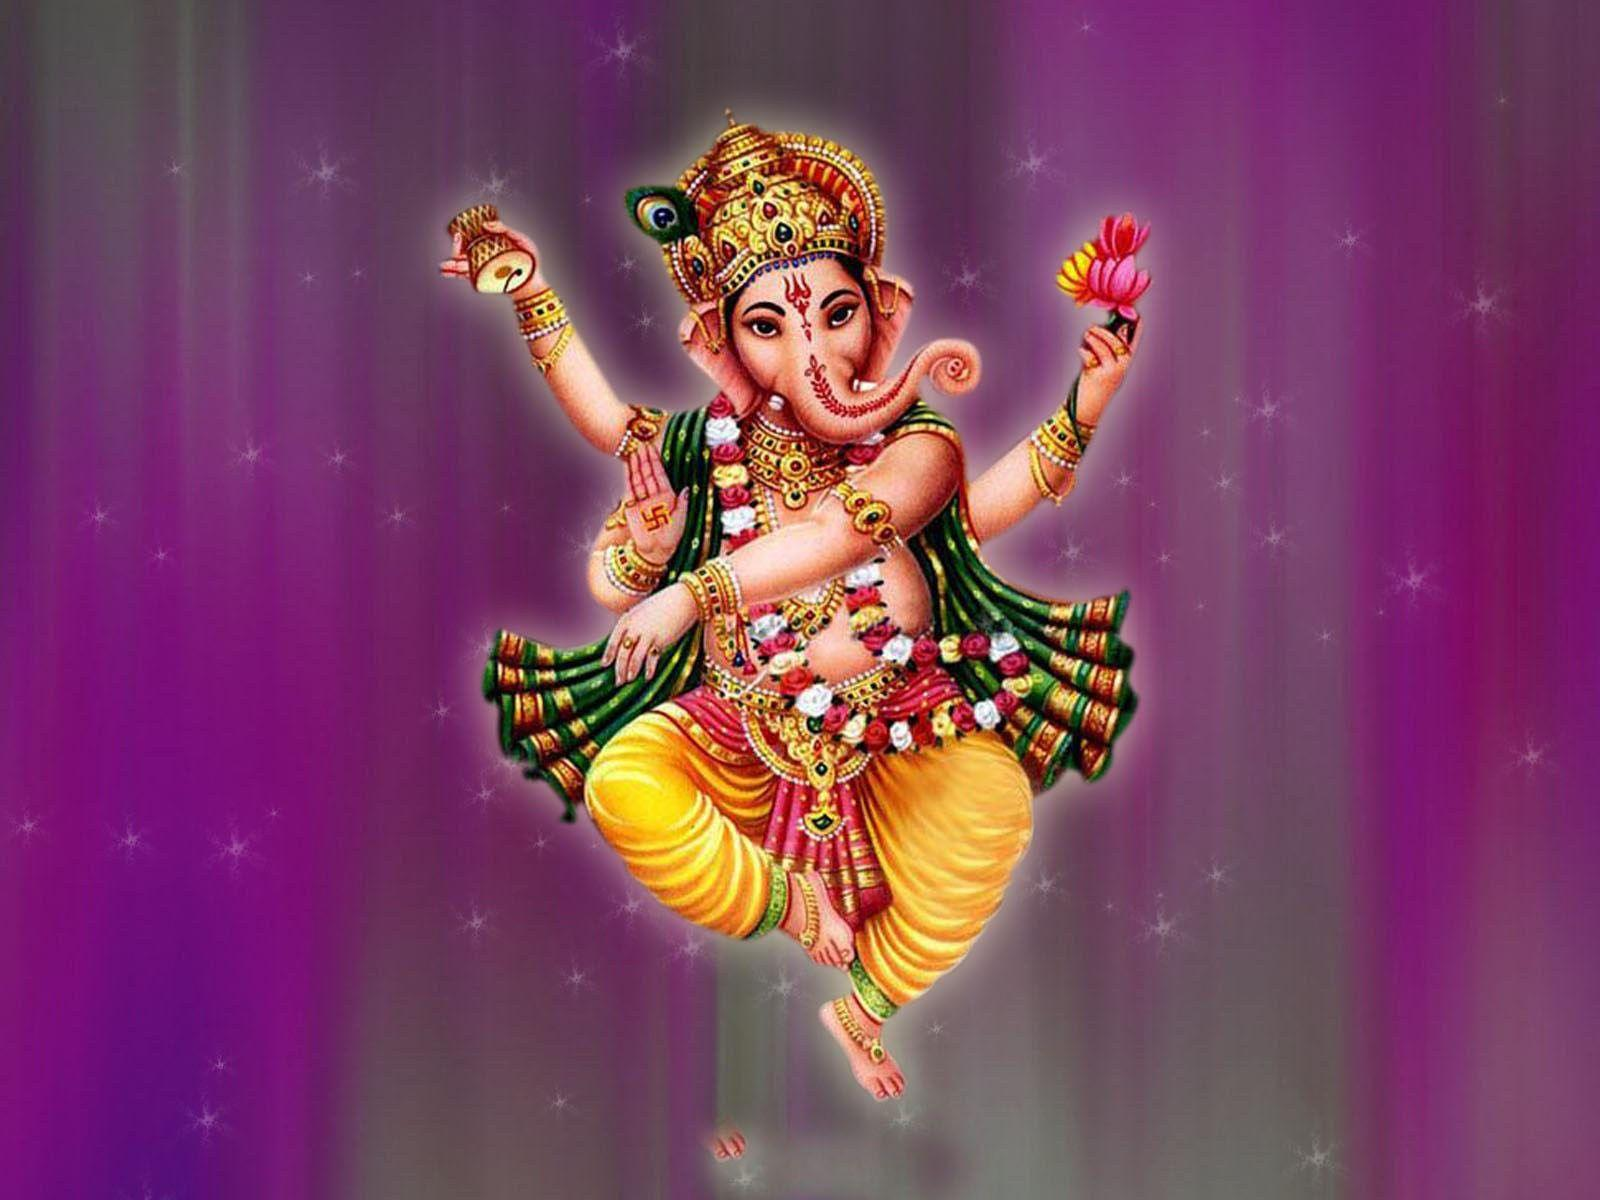 Get Lord Ganesha Hd Wallpapers 1080P For Desktop Download